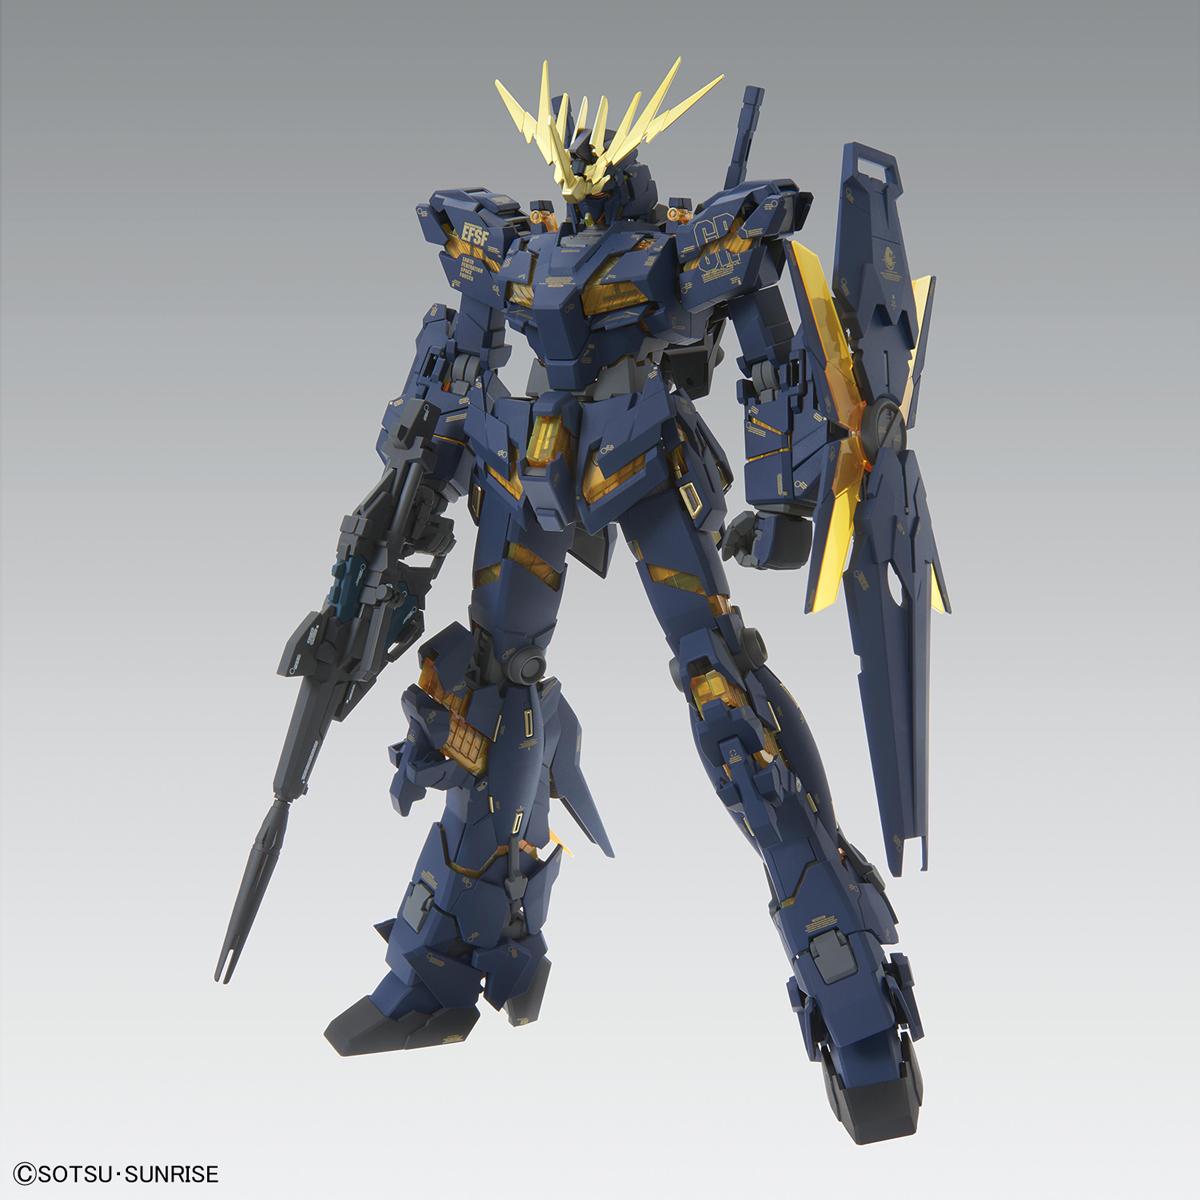 62010MG 202 1/100 RX-0 ユニコーンガンダム2号機 バンシィ Ver.Ka [Unicorn Gundam 02 Banshee] 5061593 4573102615930 0227474 4549660274742